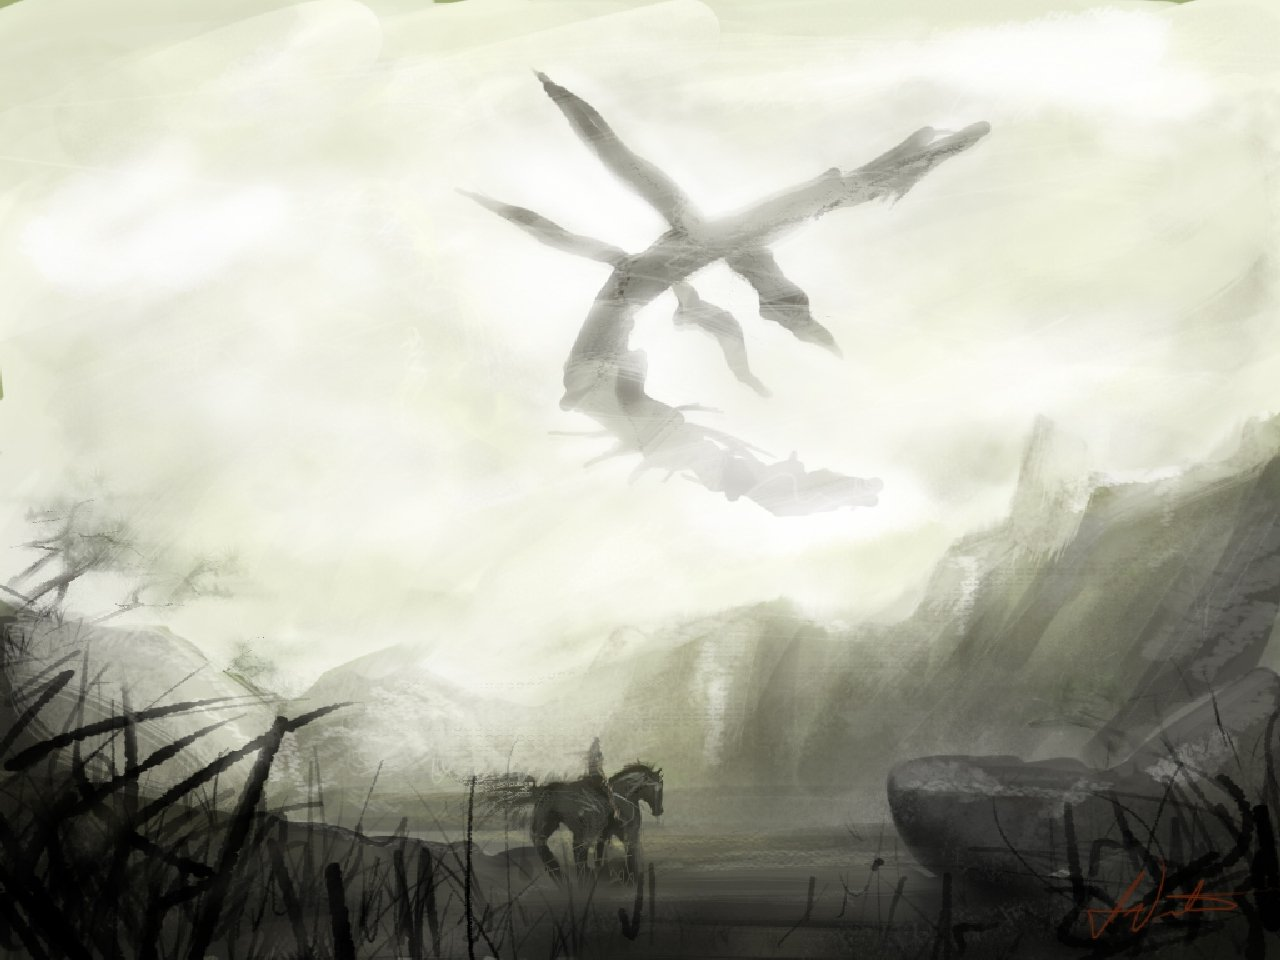 Игра. Легенда. История. Шедевр - Shadow of the Colossus! - Изображение 3